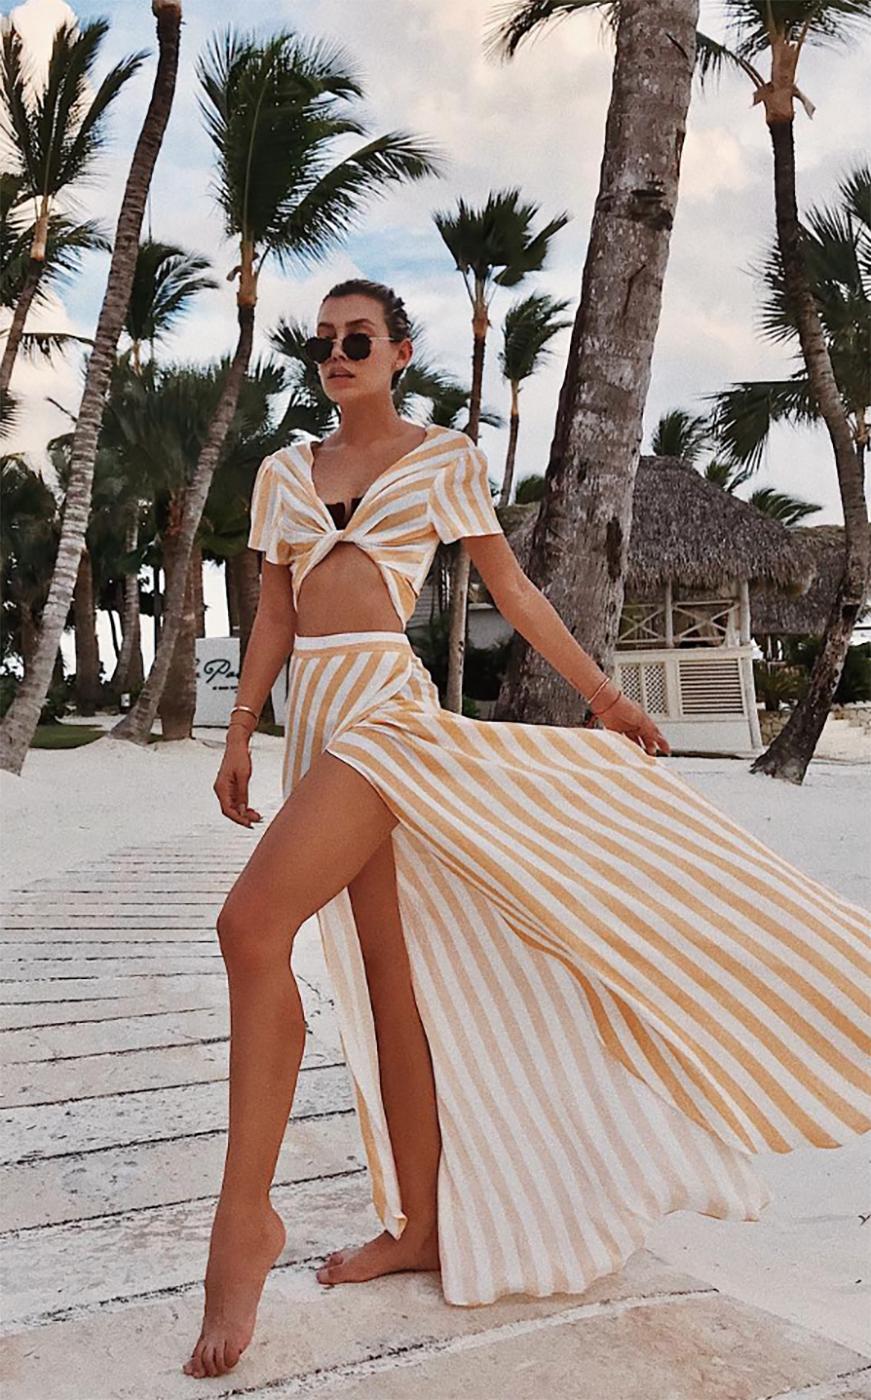 influencer, blogger, fashion, moda, street style, estilo, outfit, ootd